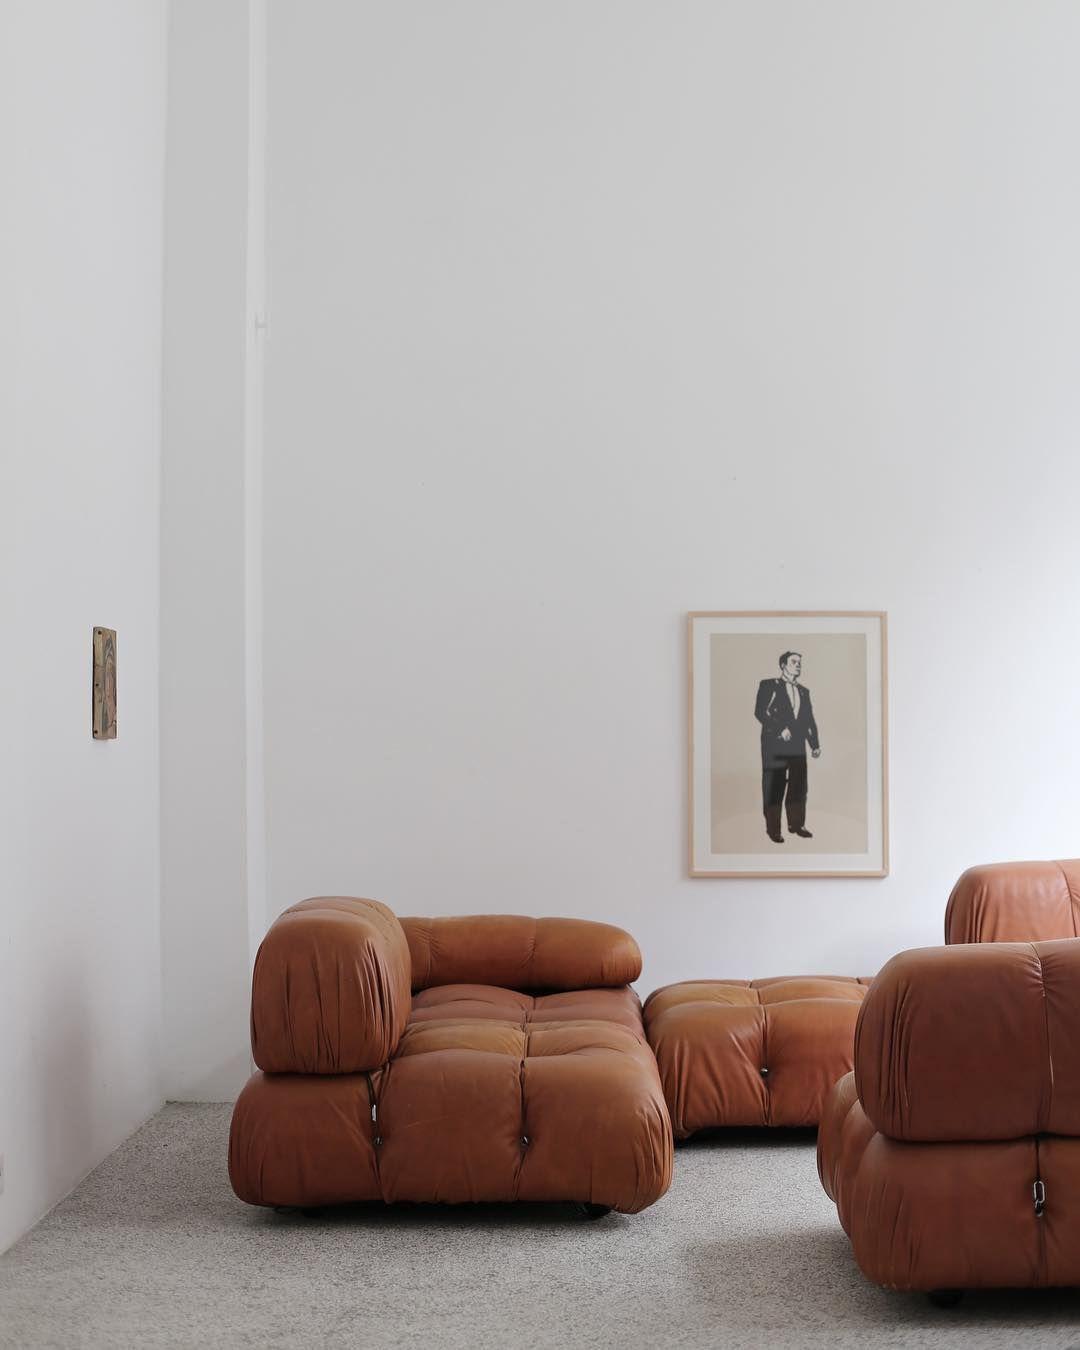 Gusch Dusseldorf On Instagram New Objects By Mario Bellini And Masayuki Kurokawa Plus Many More Available M Sofa Design Haus Interieurs Wohnzimmer Dekor